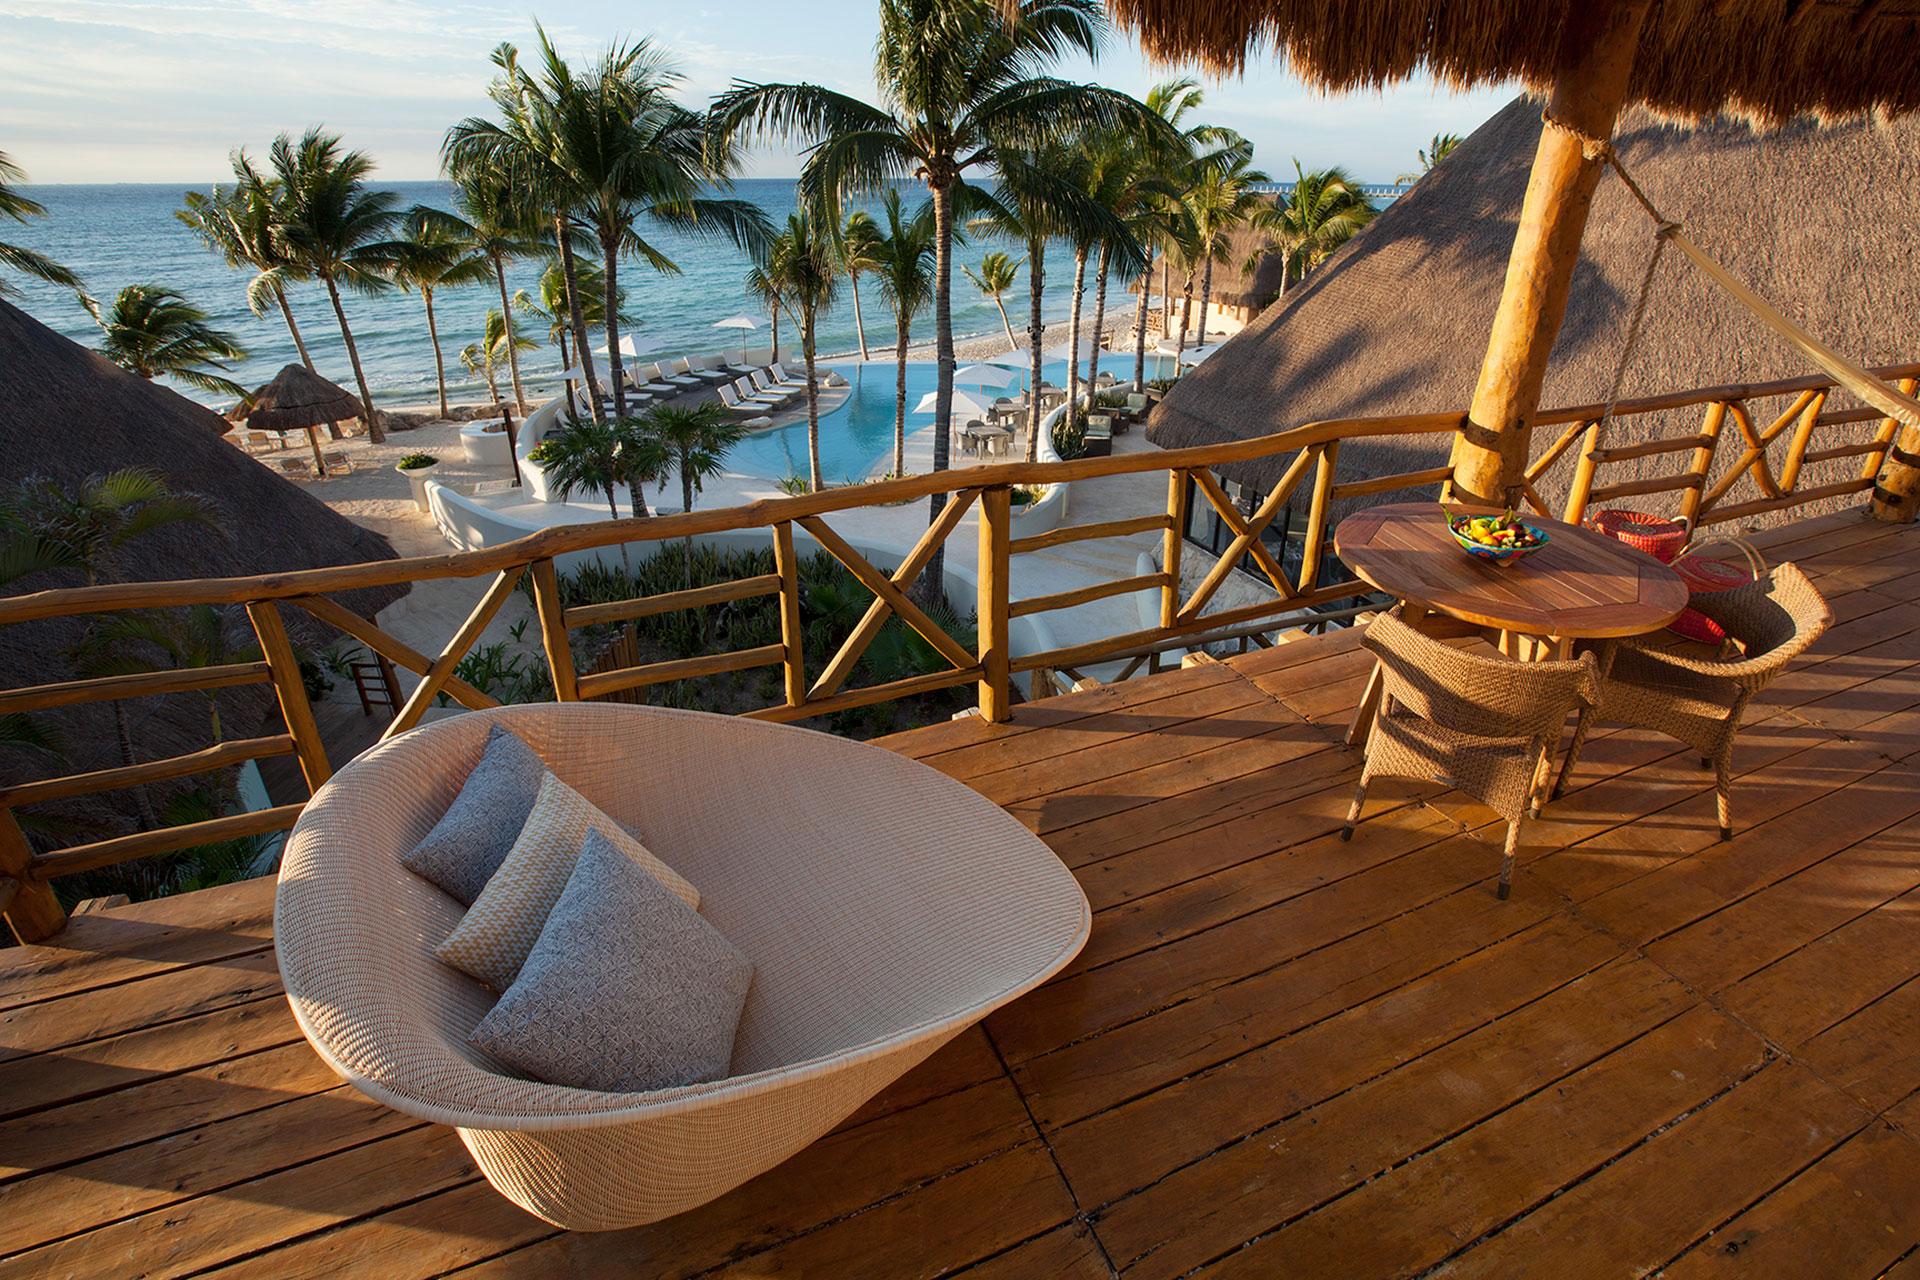 Makehal Beach Resort; Courtesy of Mahekal Beach Resort